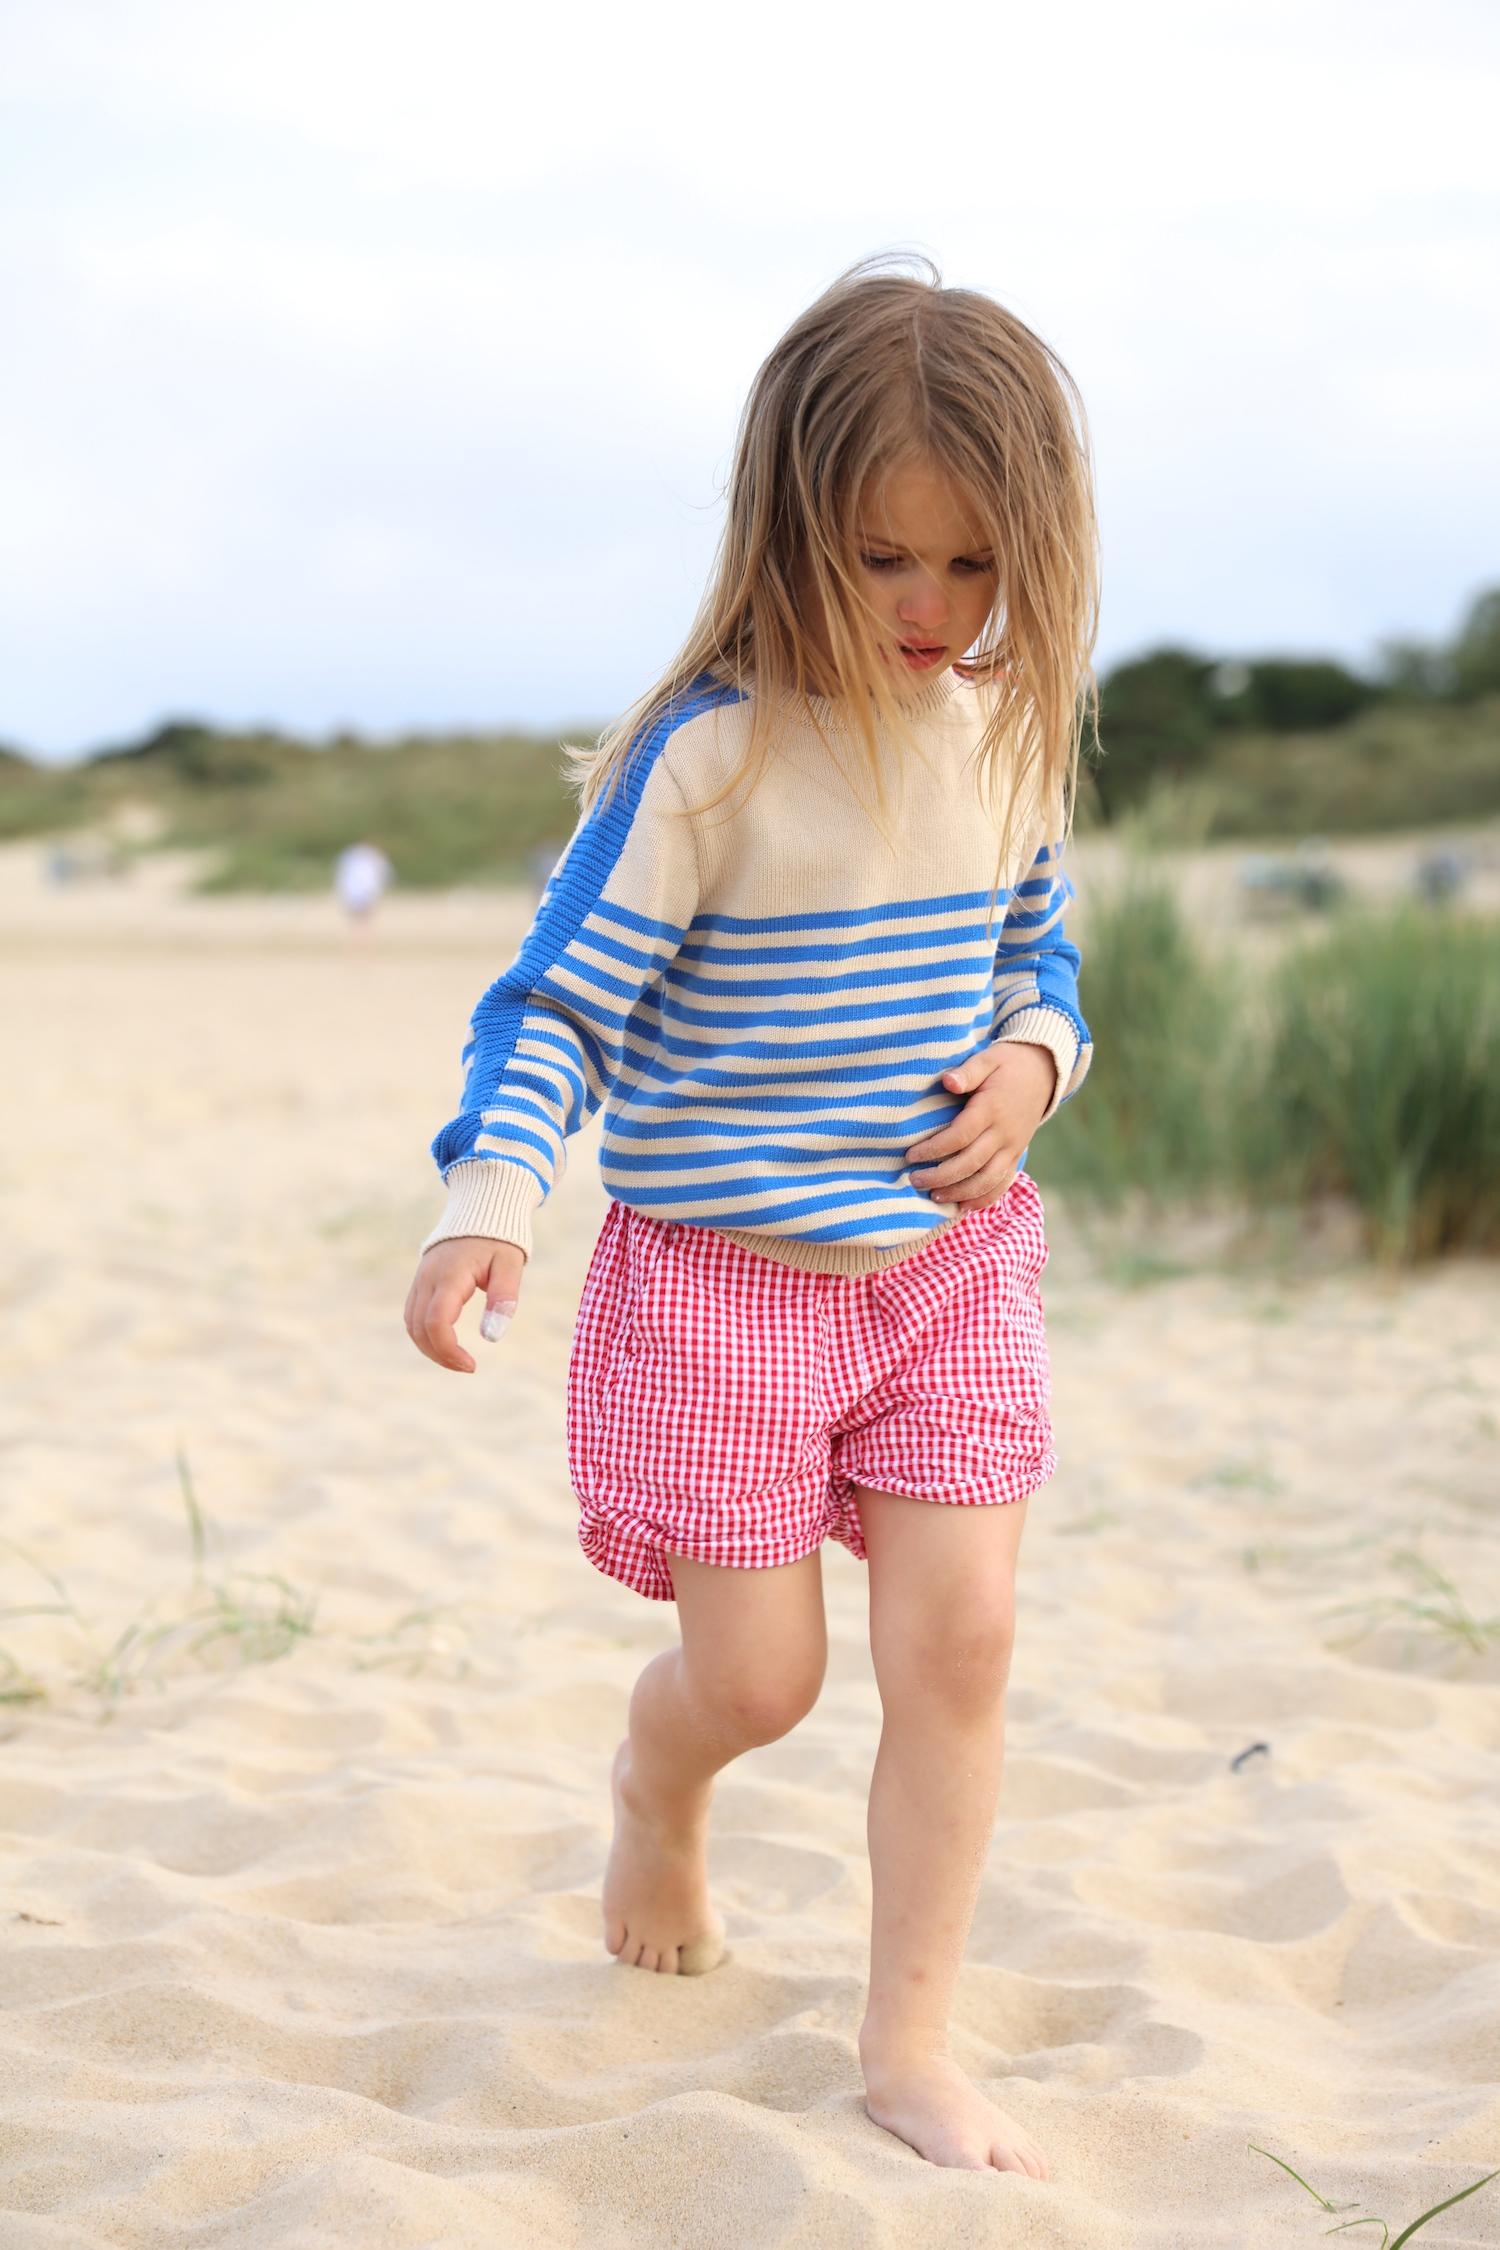 Tootsa_macginty_shorts